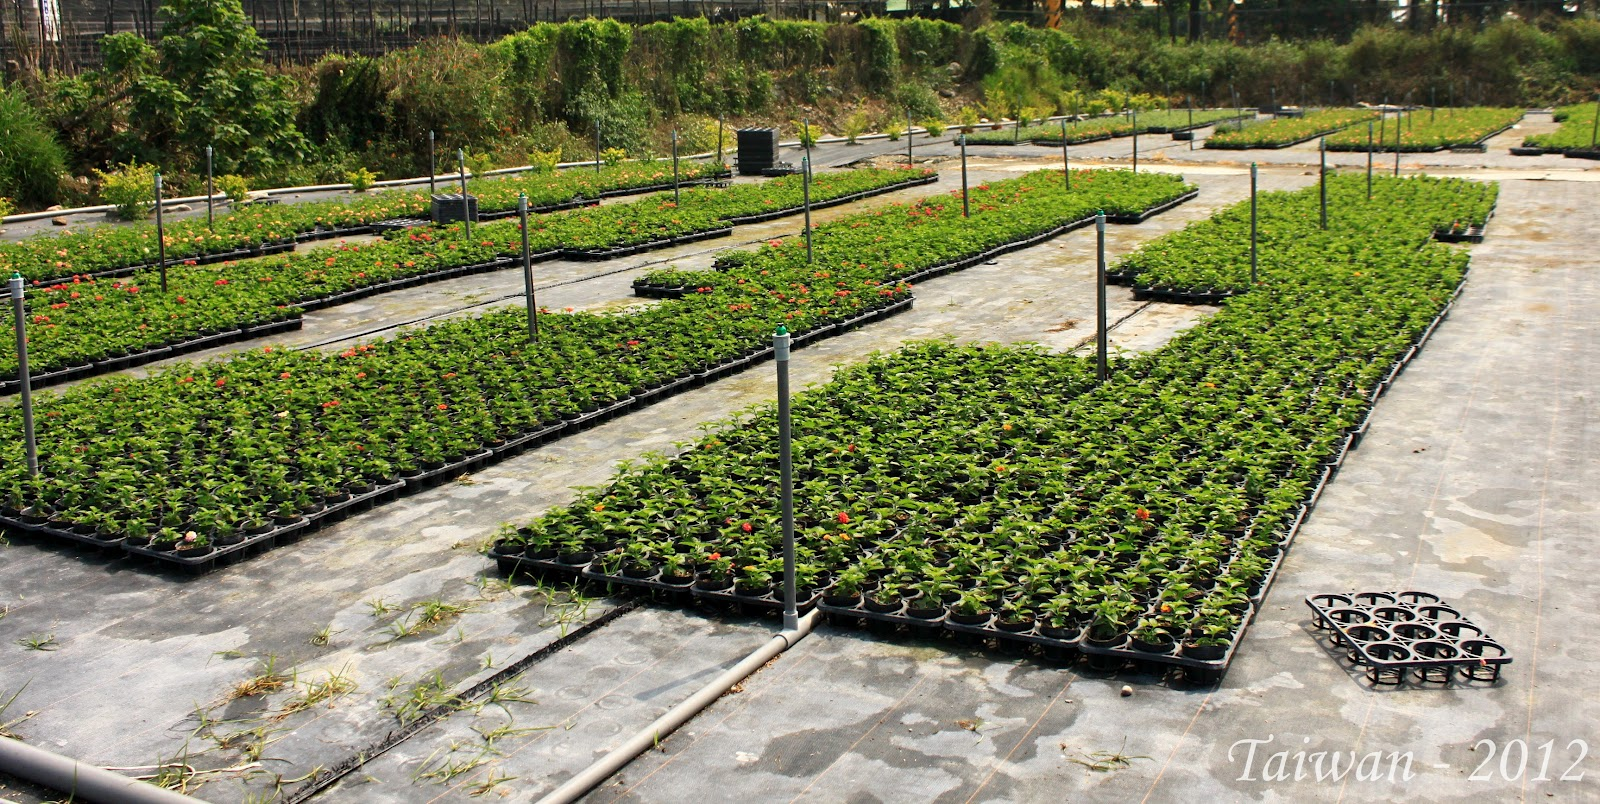 Estudiando agricultura en taiw n un vivero de plantas de for Como establecer un vivero